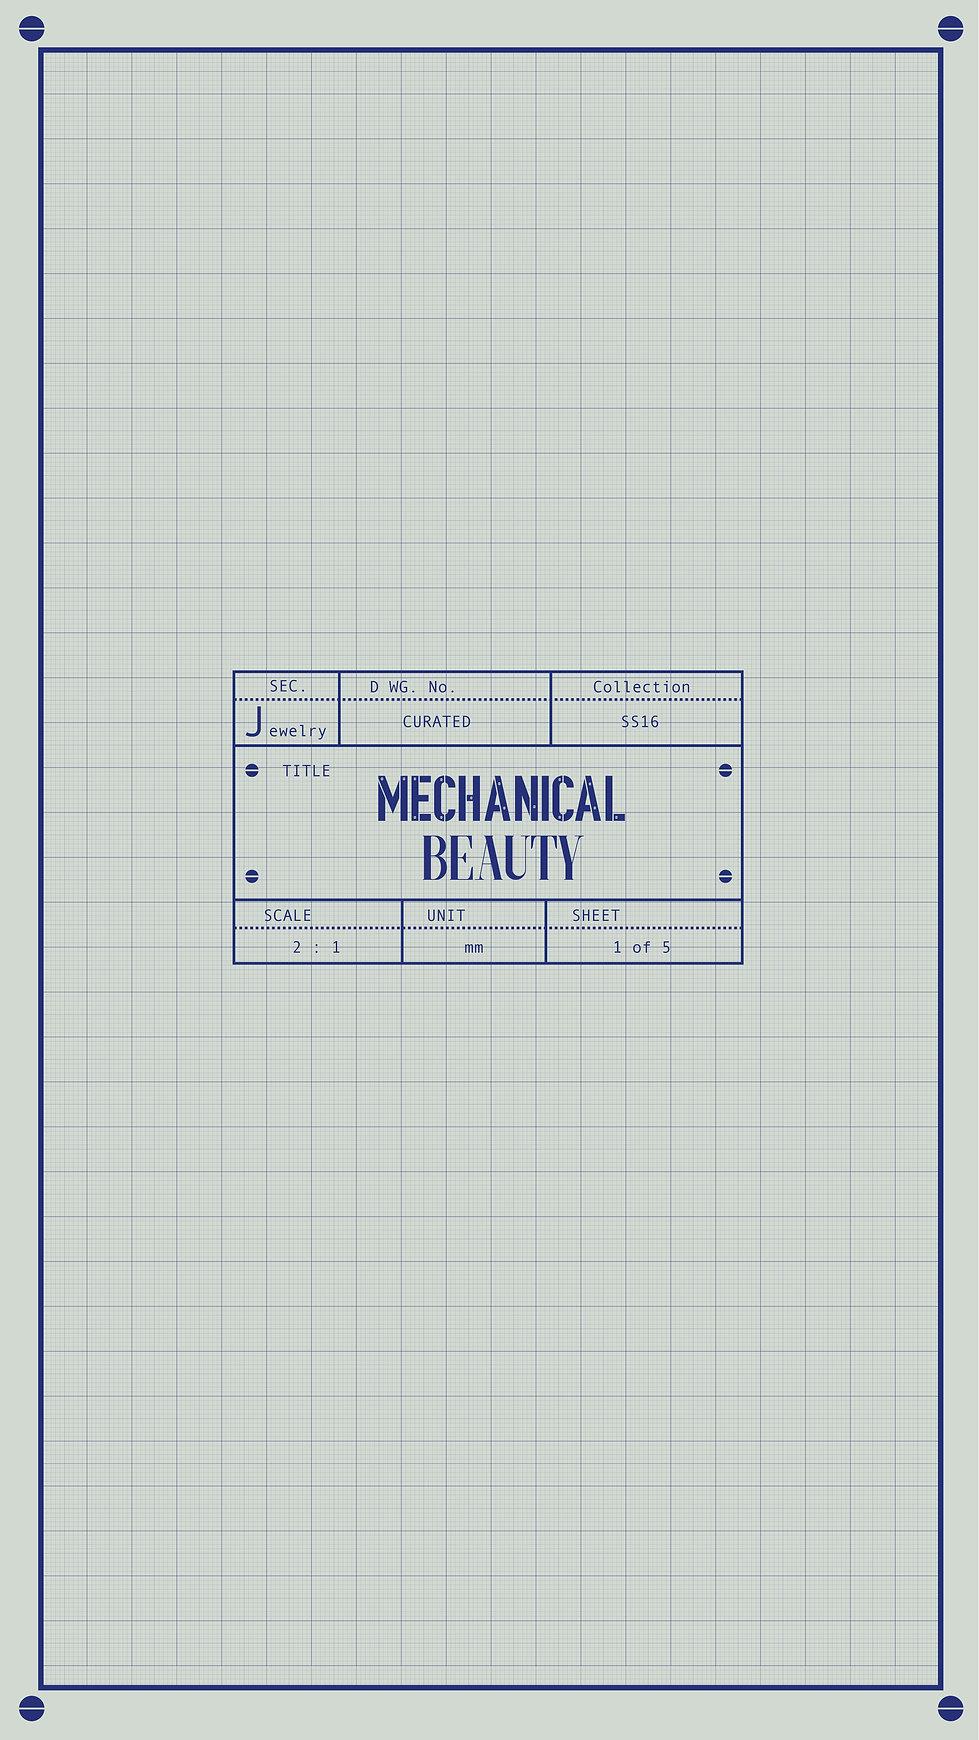 MECHANICAL BEAUTY - 01.jpg